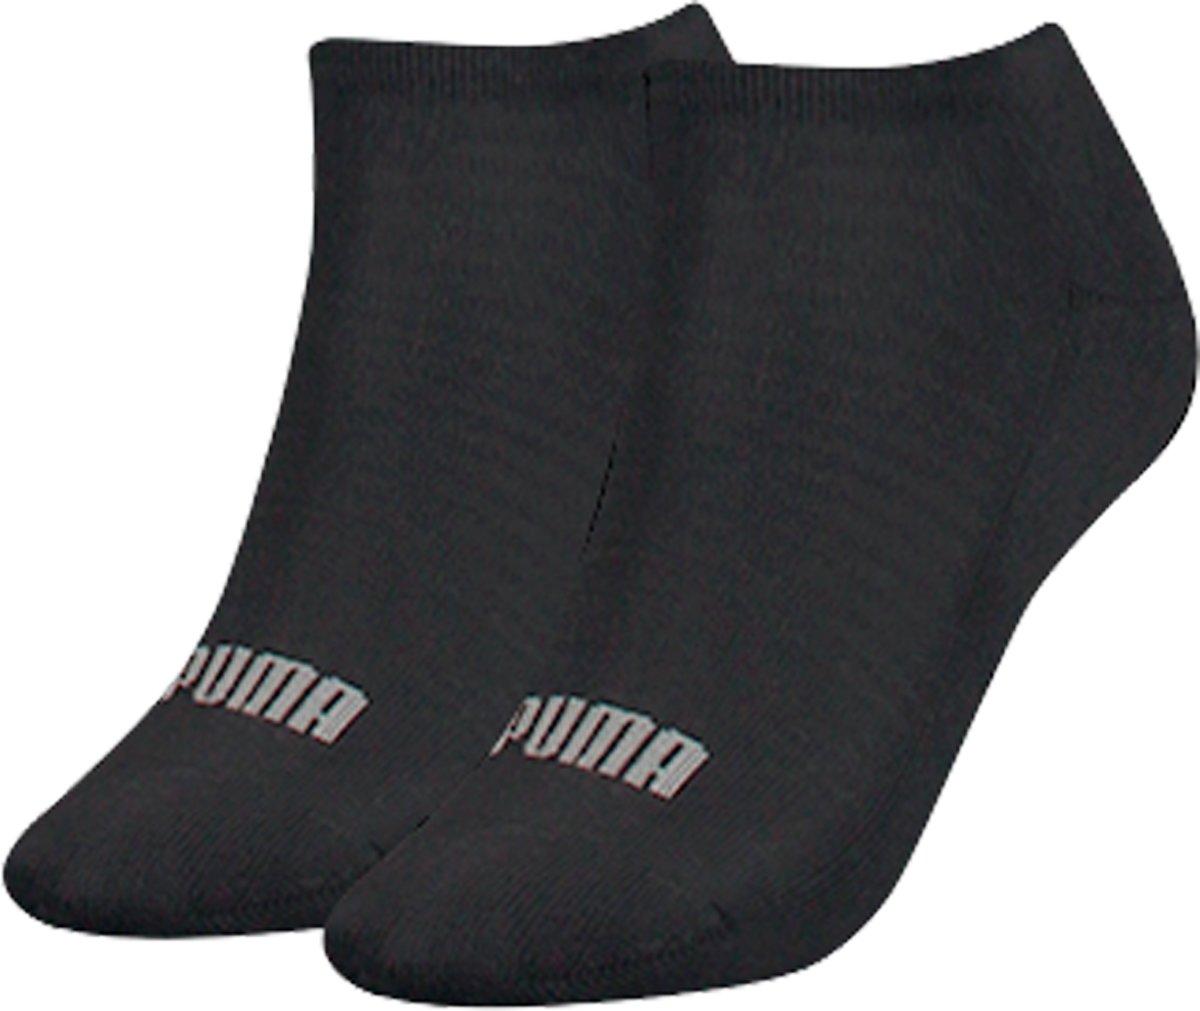 Puma - Dames 2-Pack Sneaker Sokken Zwart - 35-38